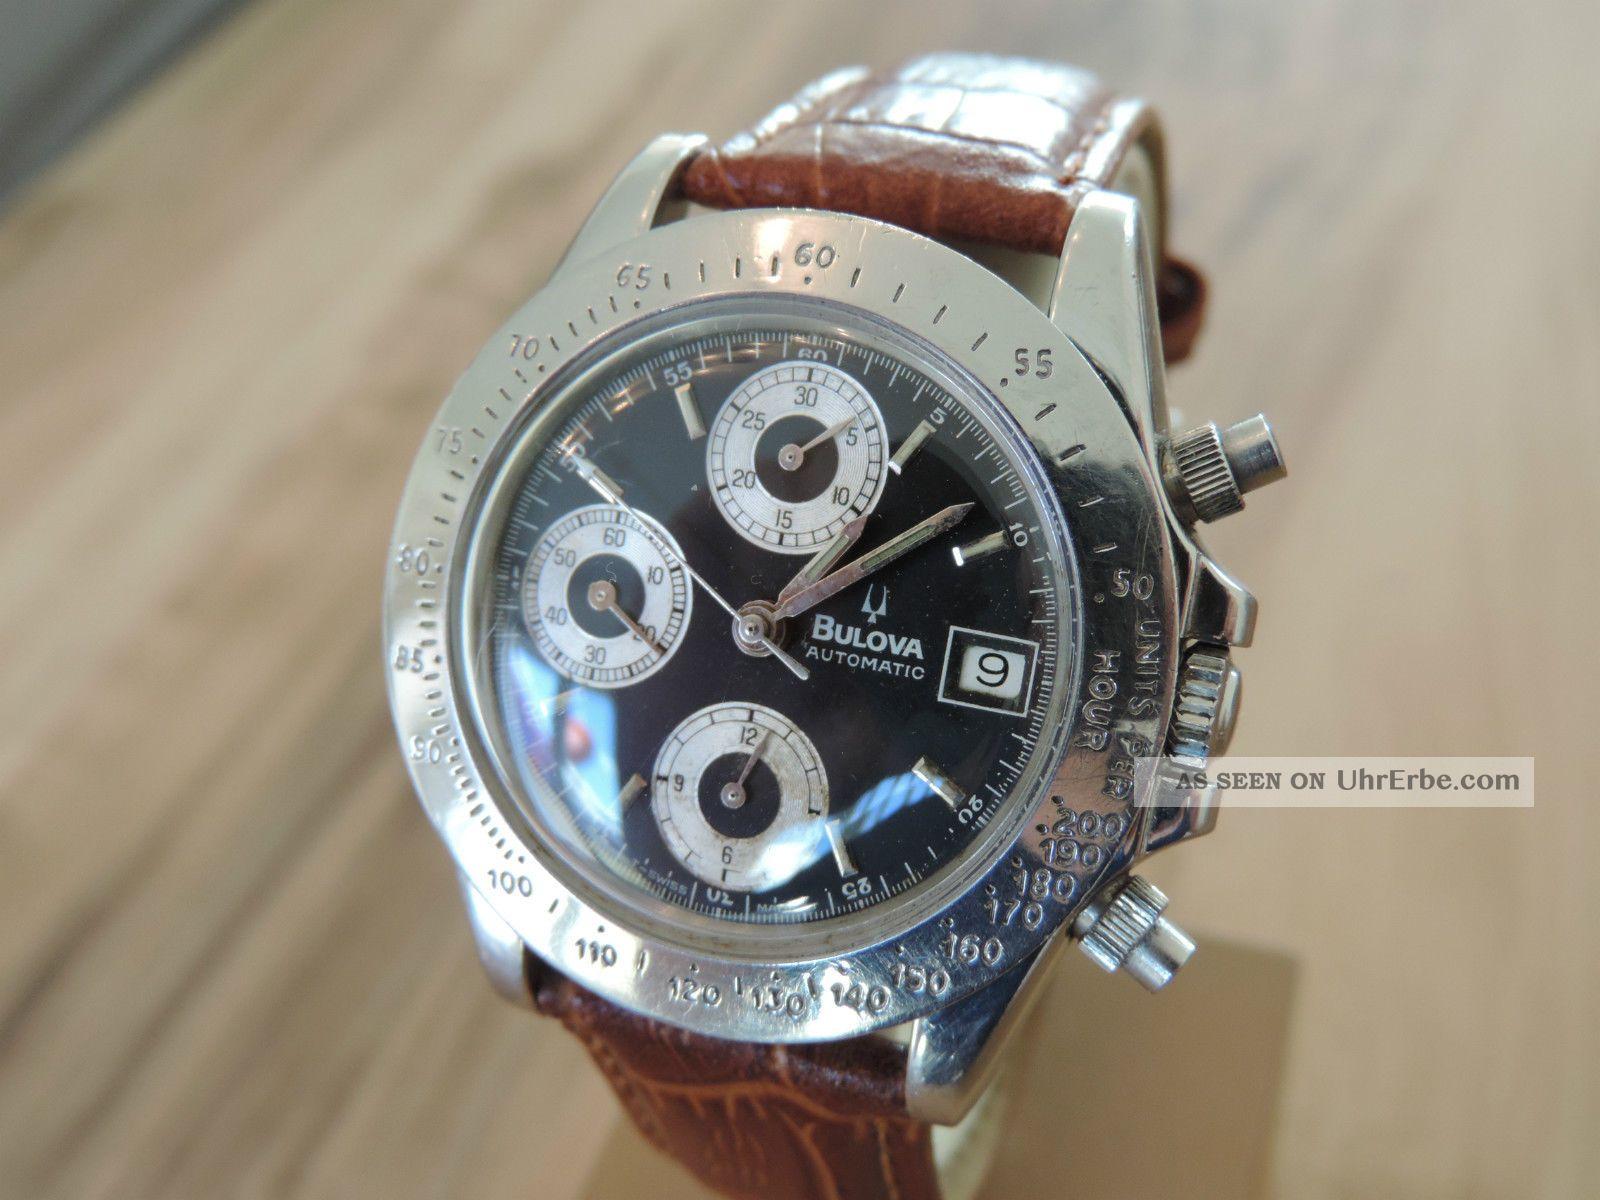 Bulova Speedtimer Automatik Chronograph Eta Valjoux 7750 Sehr Selten 17 Jewels Armbanduhren Bild